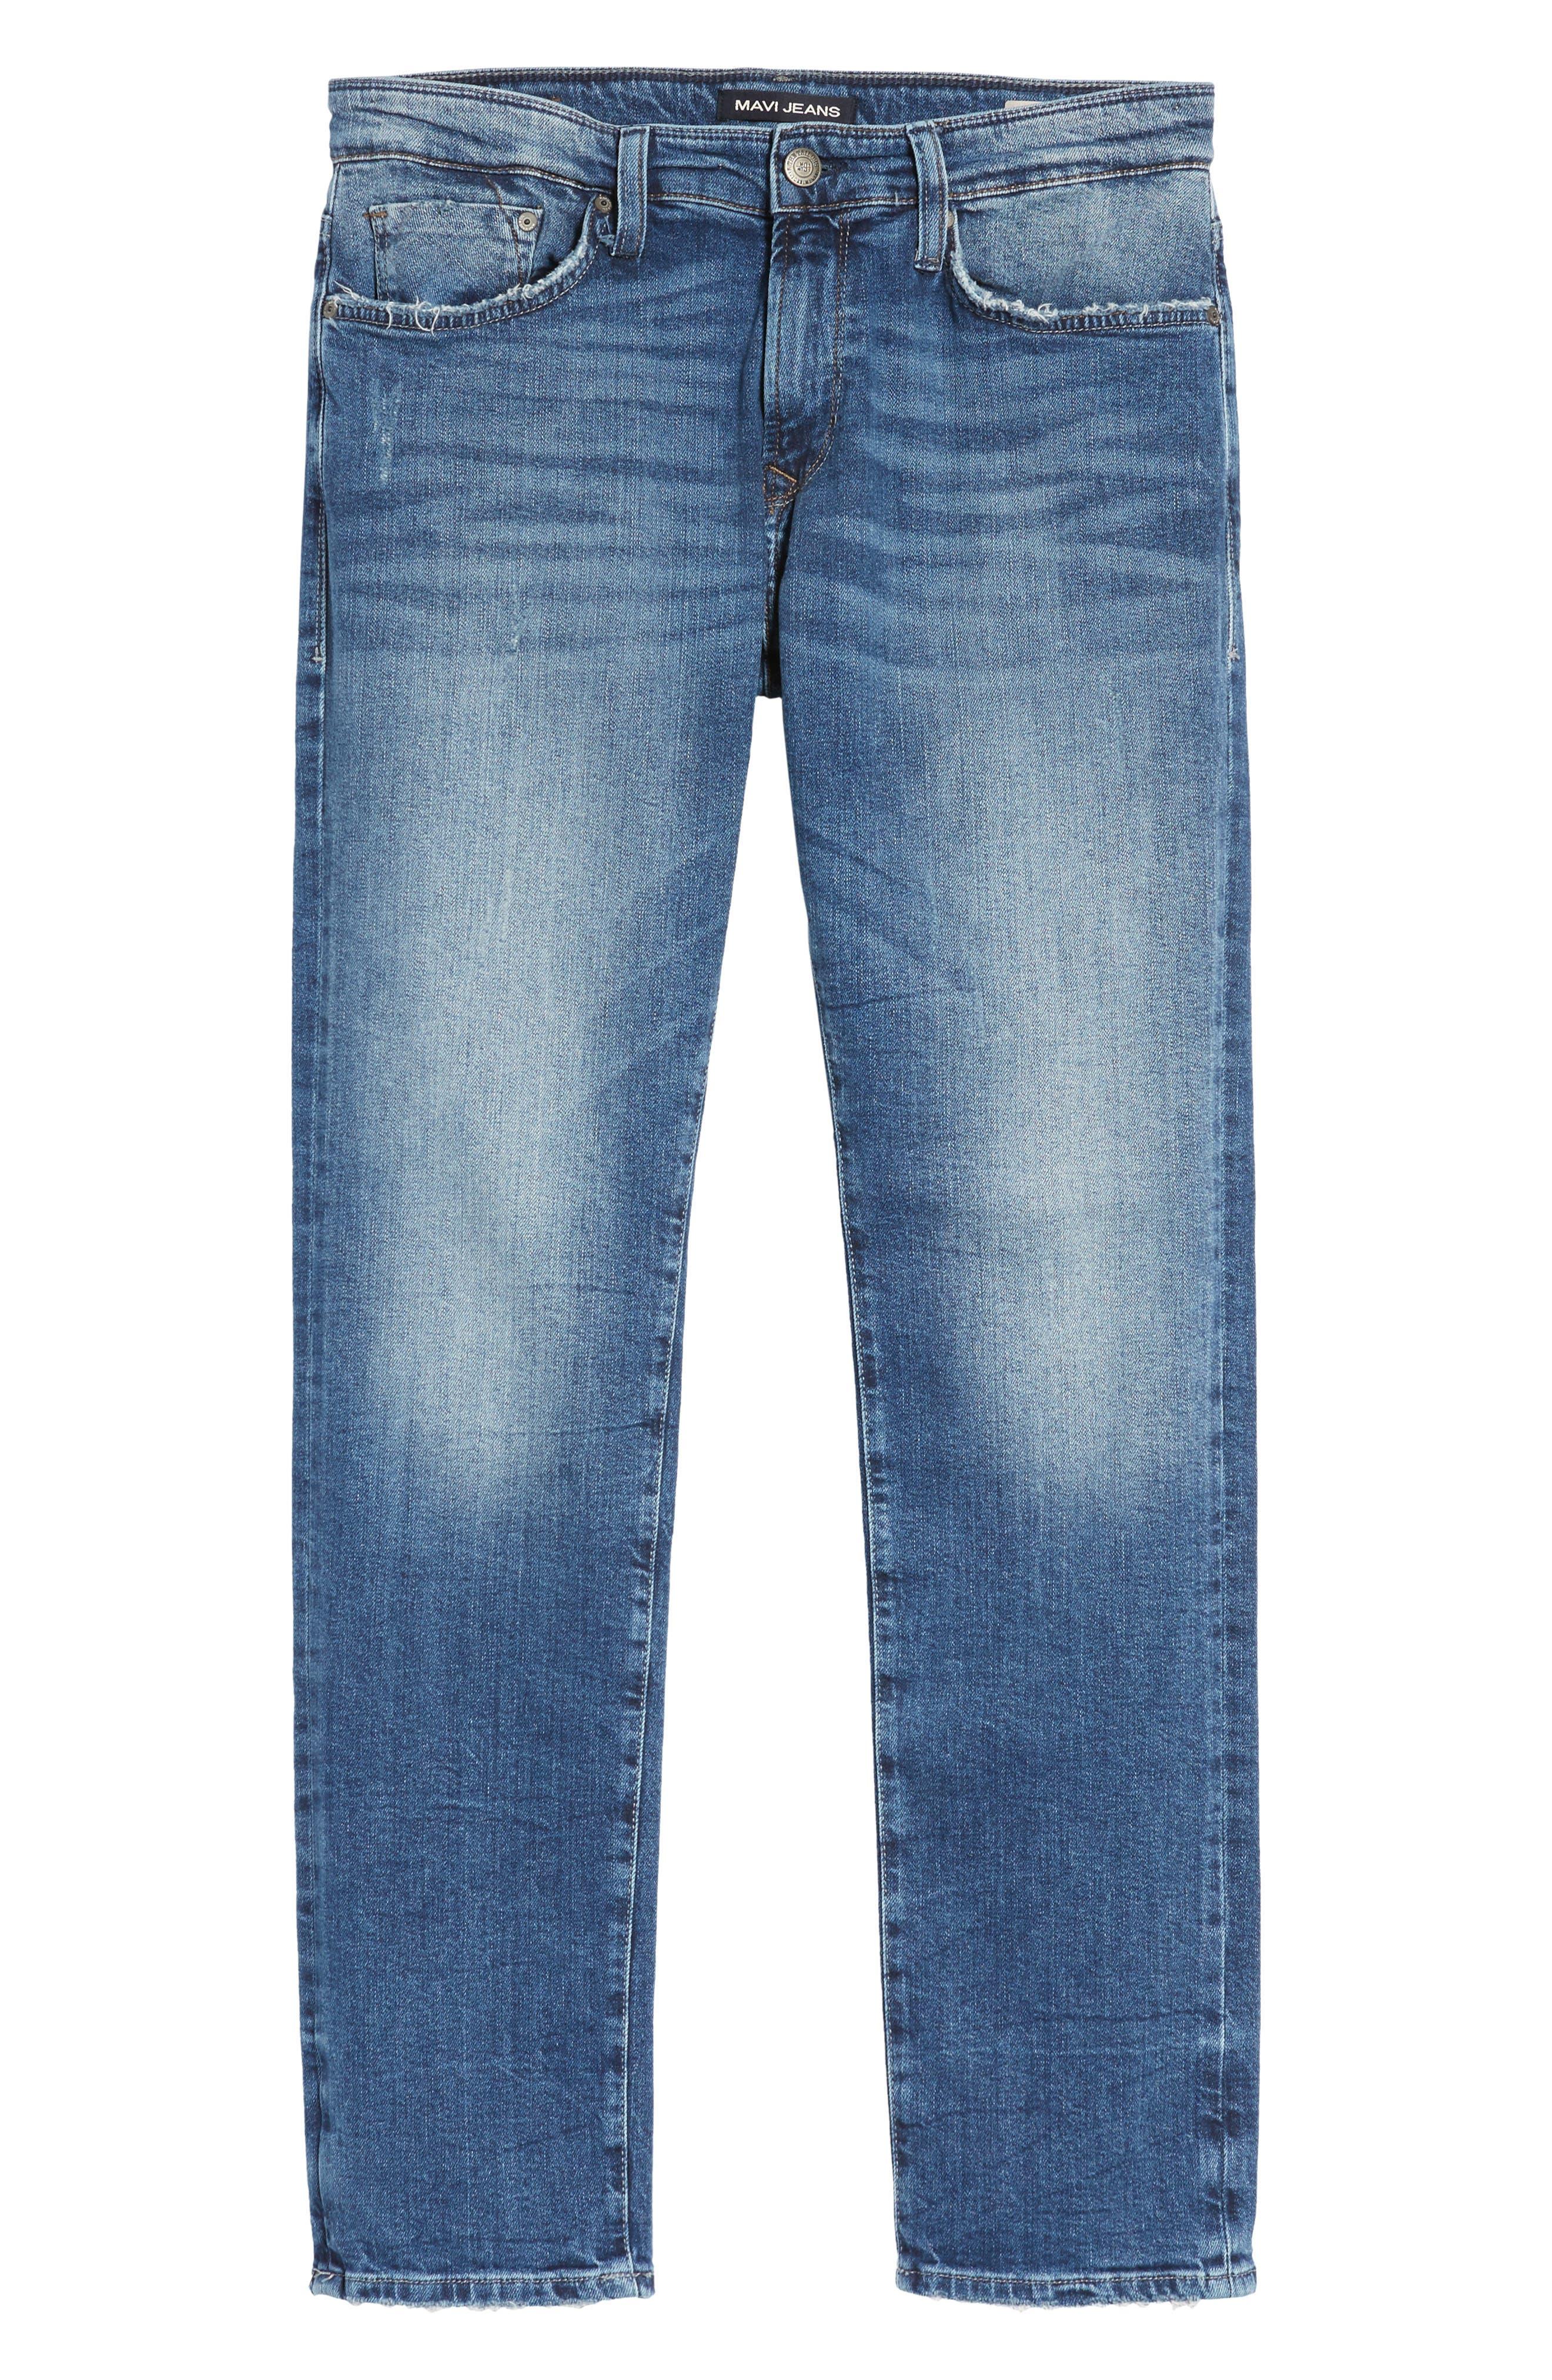 Marcus Slim Straight Leg Jeans,                             Alternate thumbnail 6, color,                             420